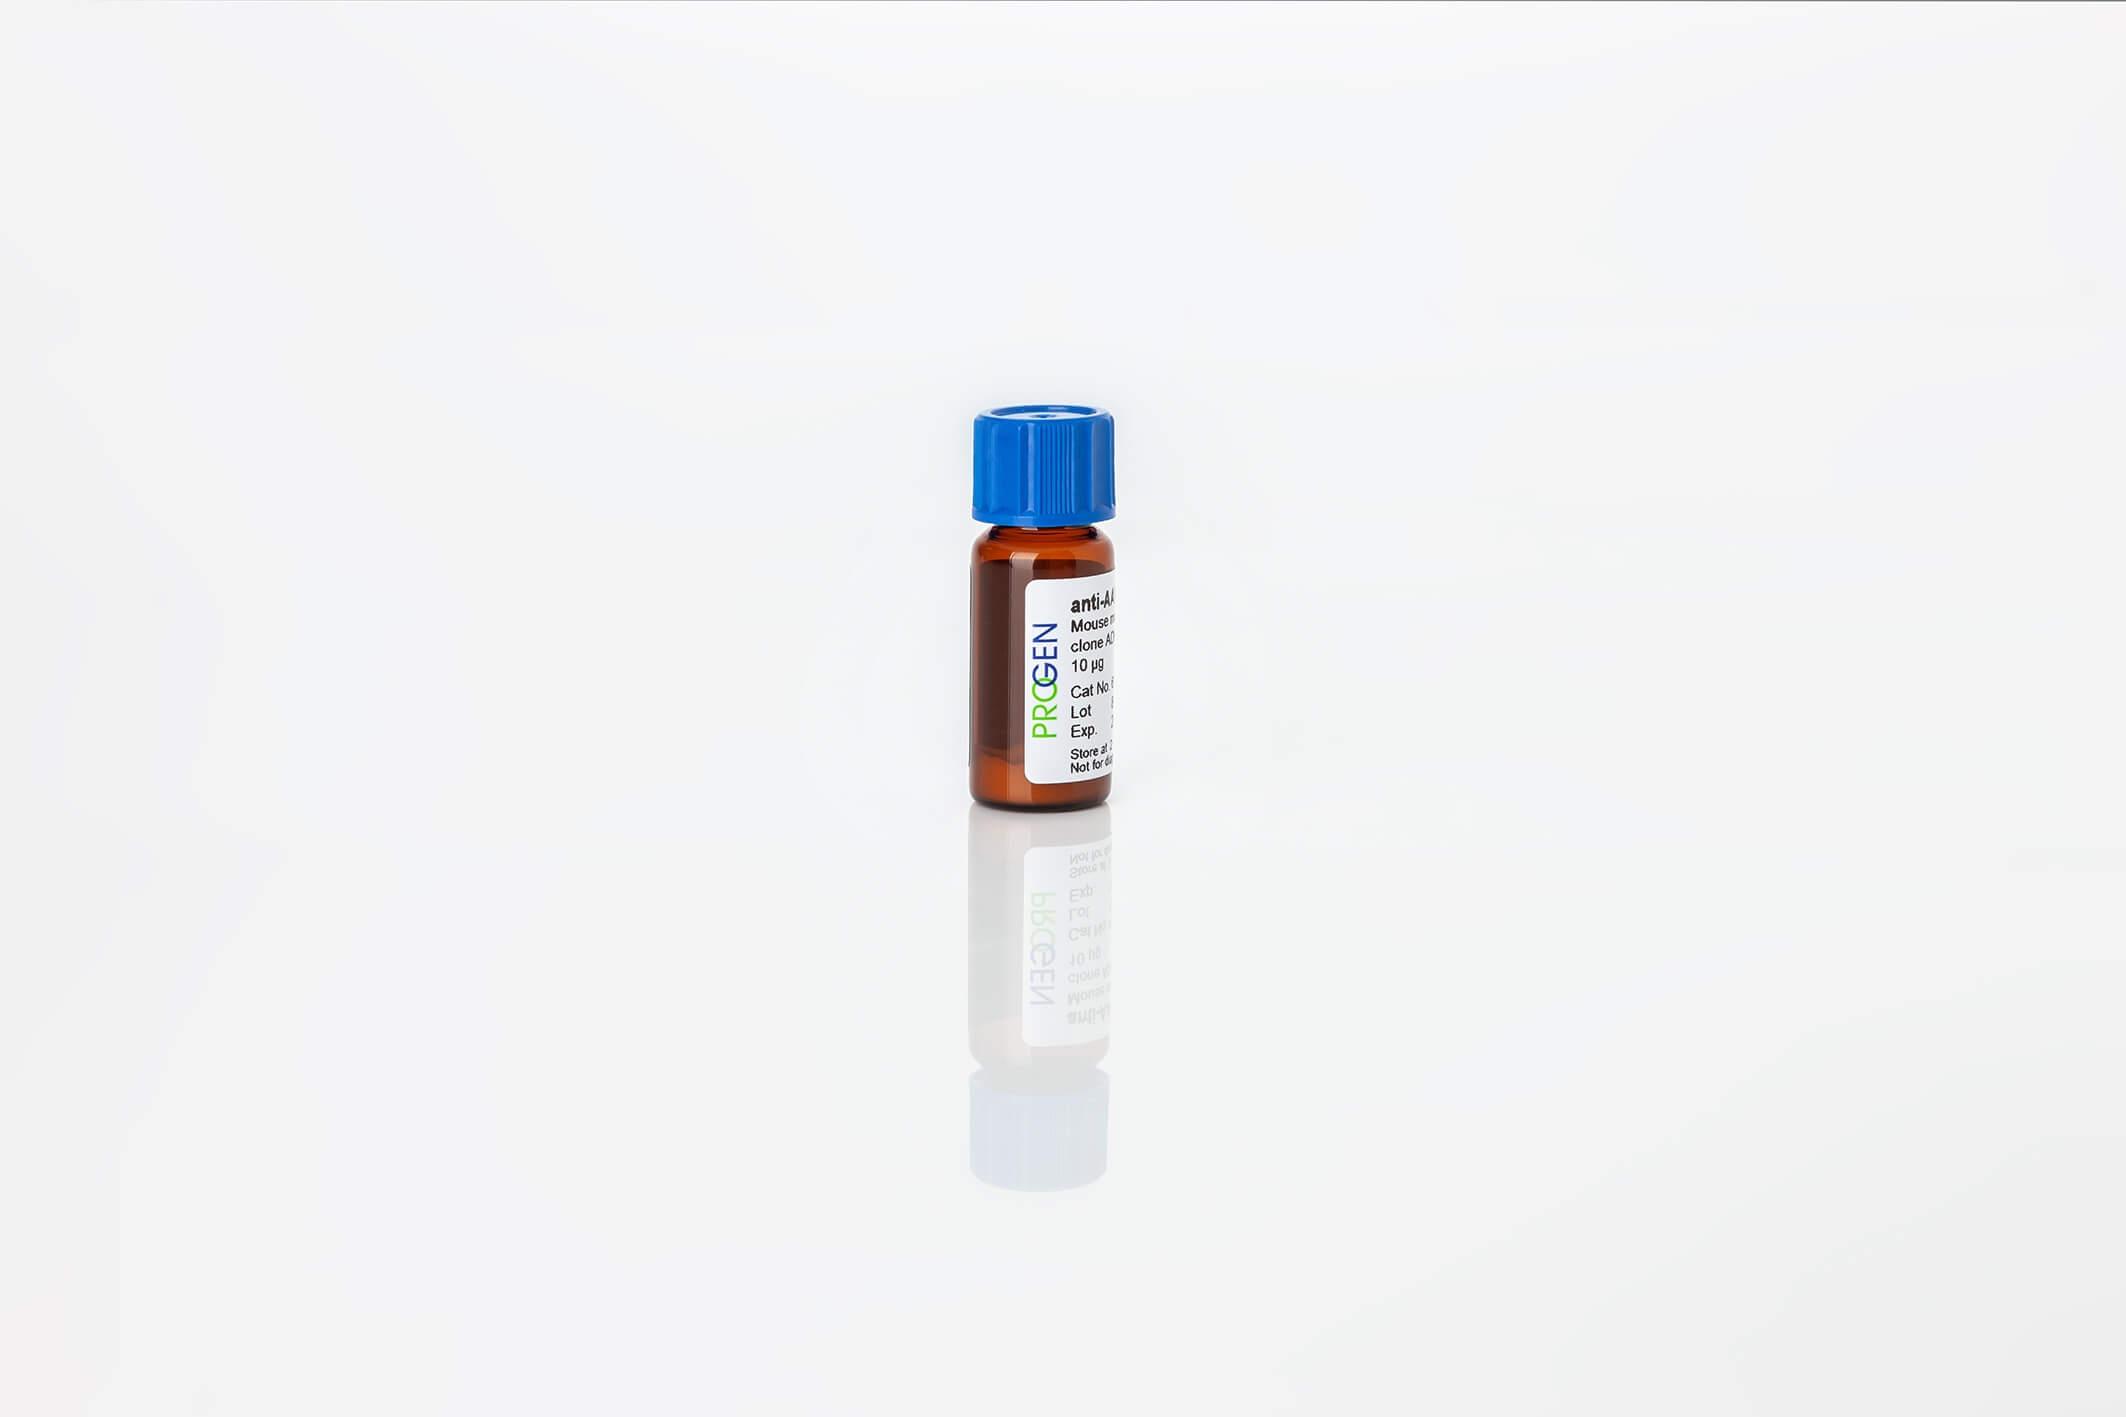 anti-Keratin K18 mouse monoclonal, Ks18.27, lyophilized, purified